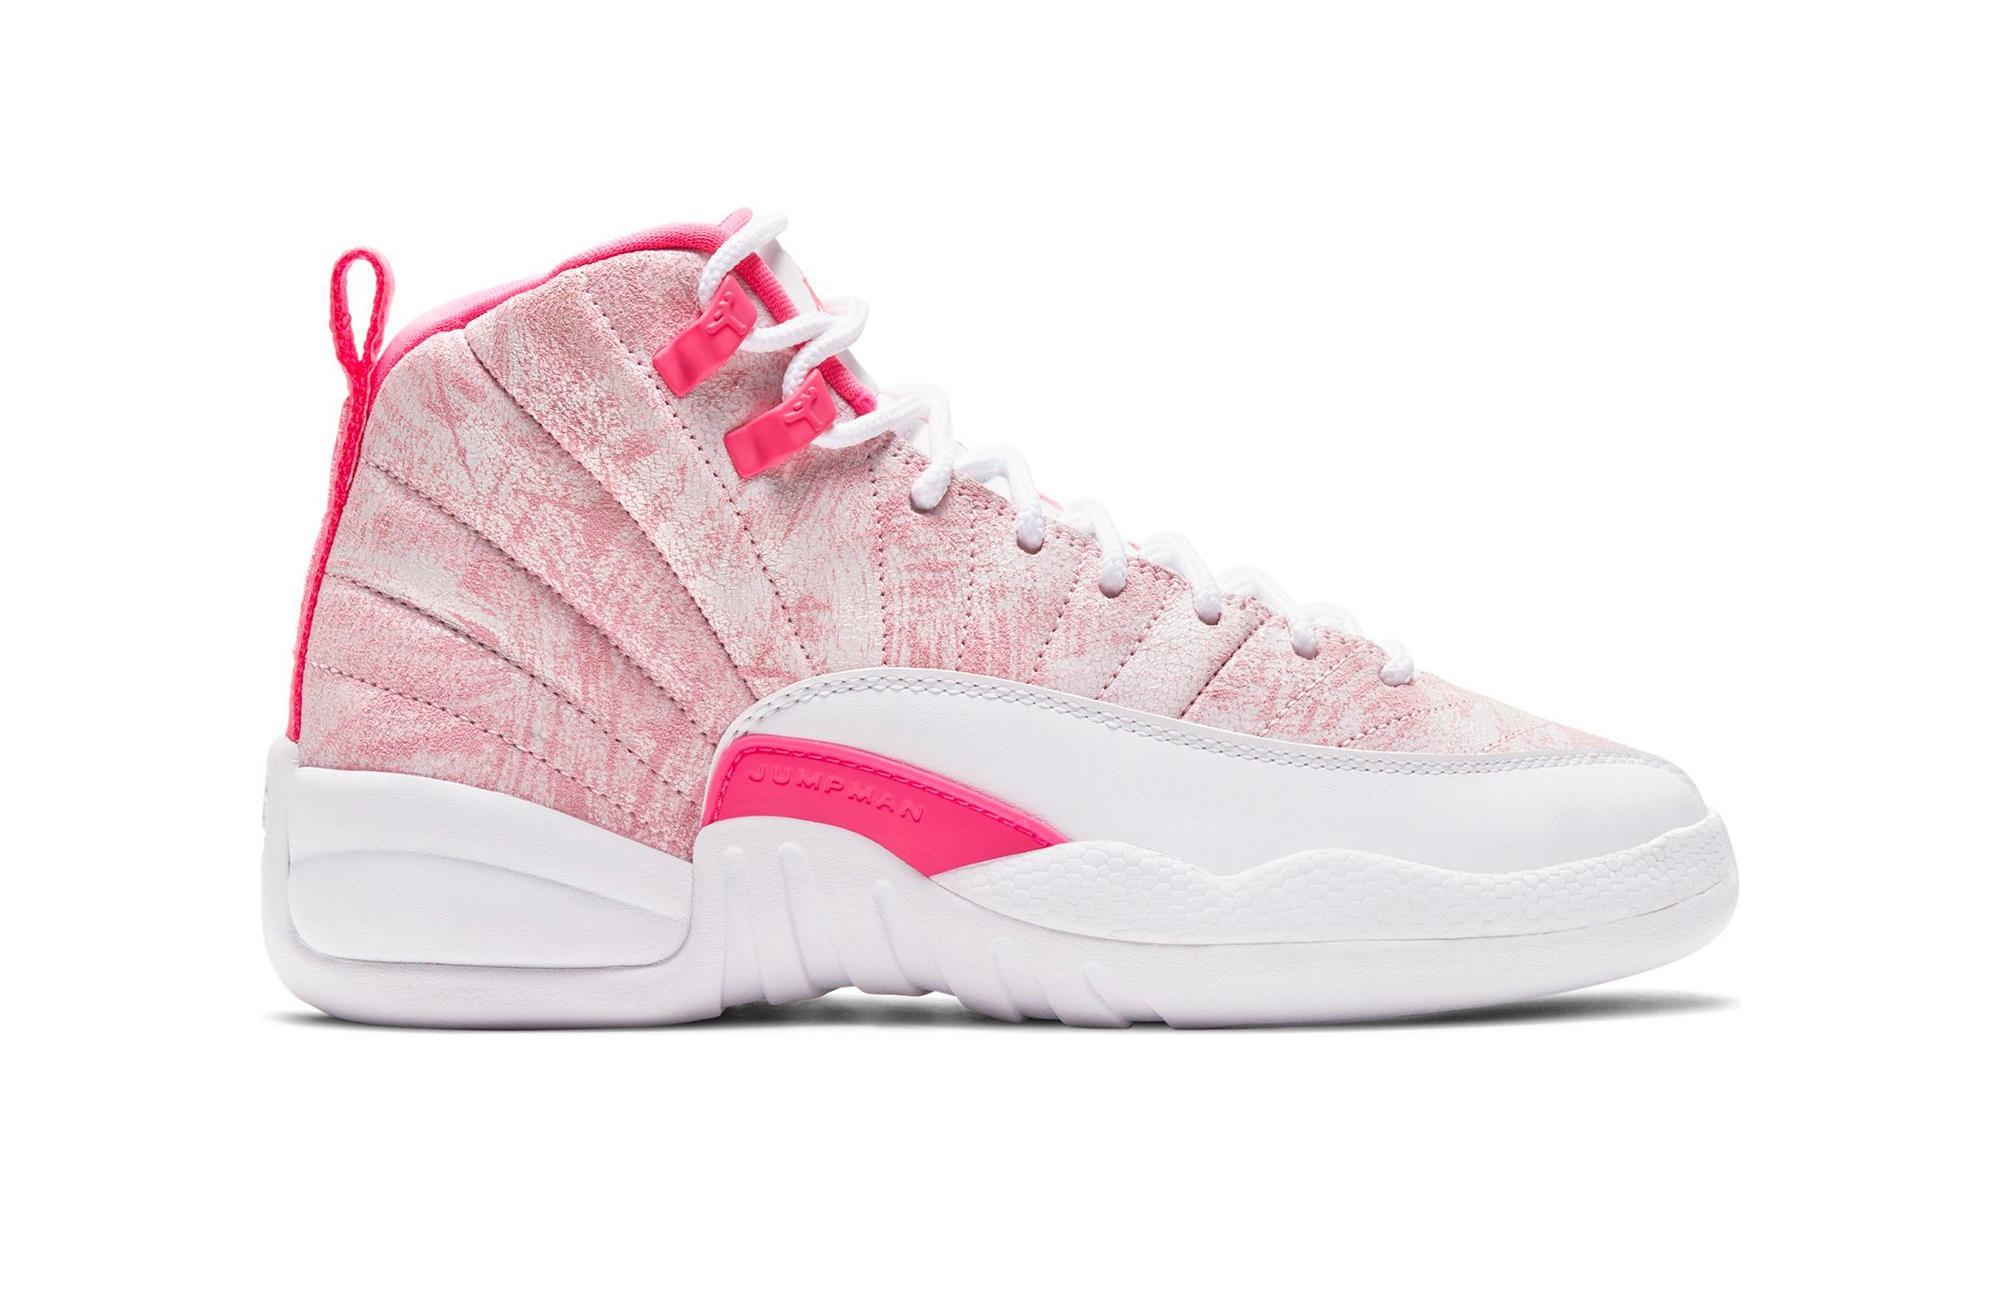 "Sneakers Release – Girls-Exclusive AJ 12 Retro ""Ice Cream ..."